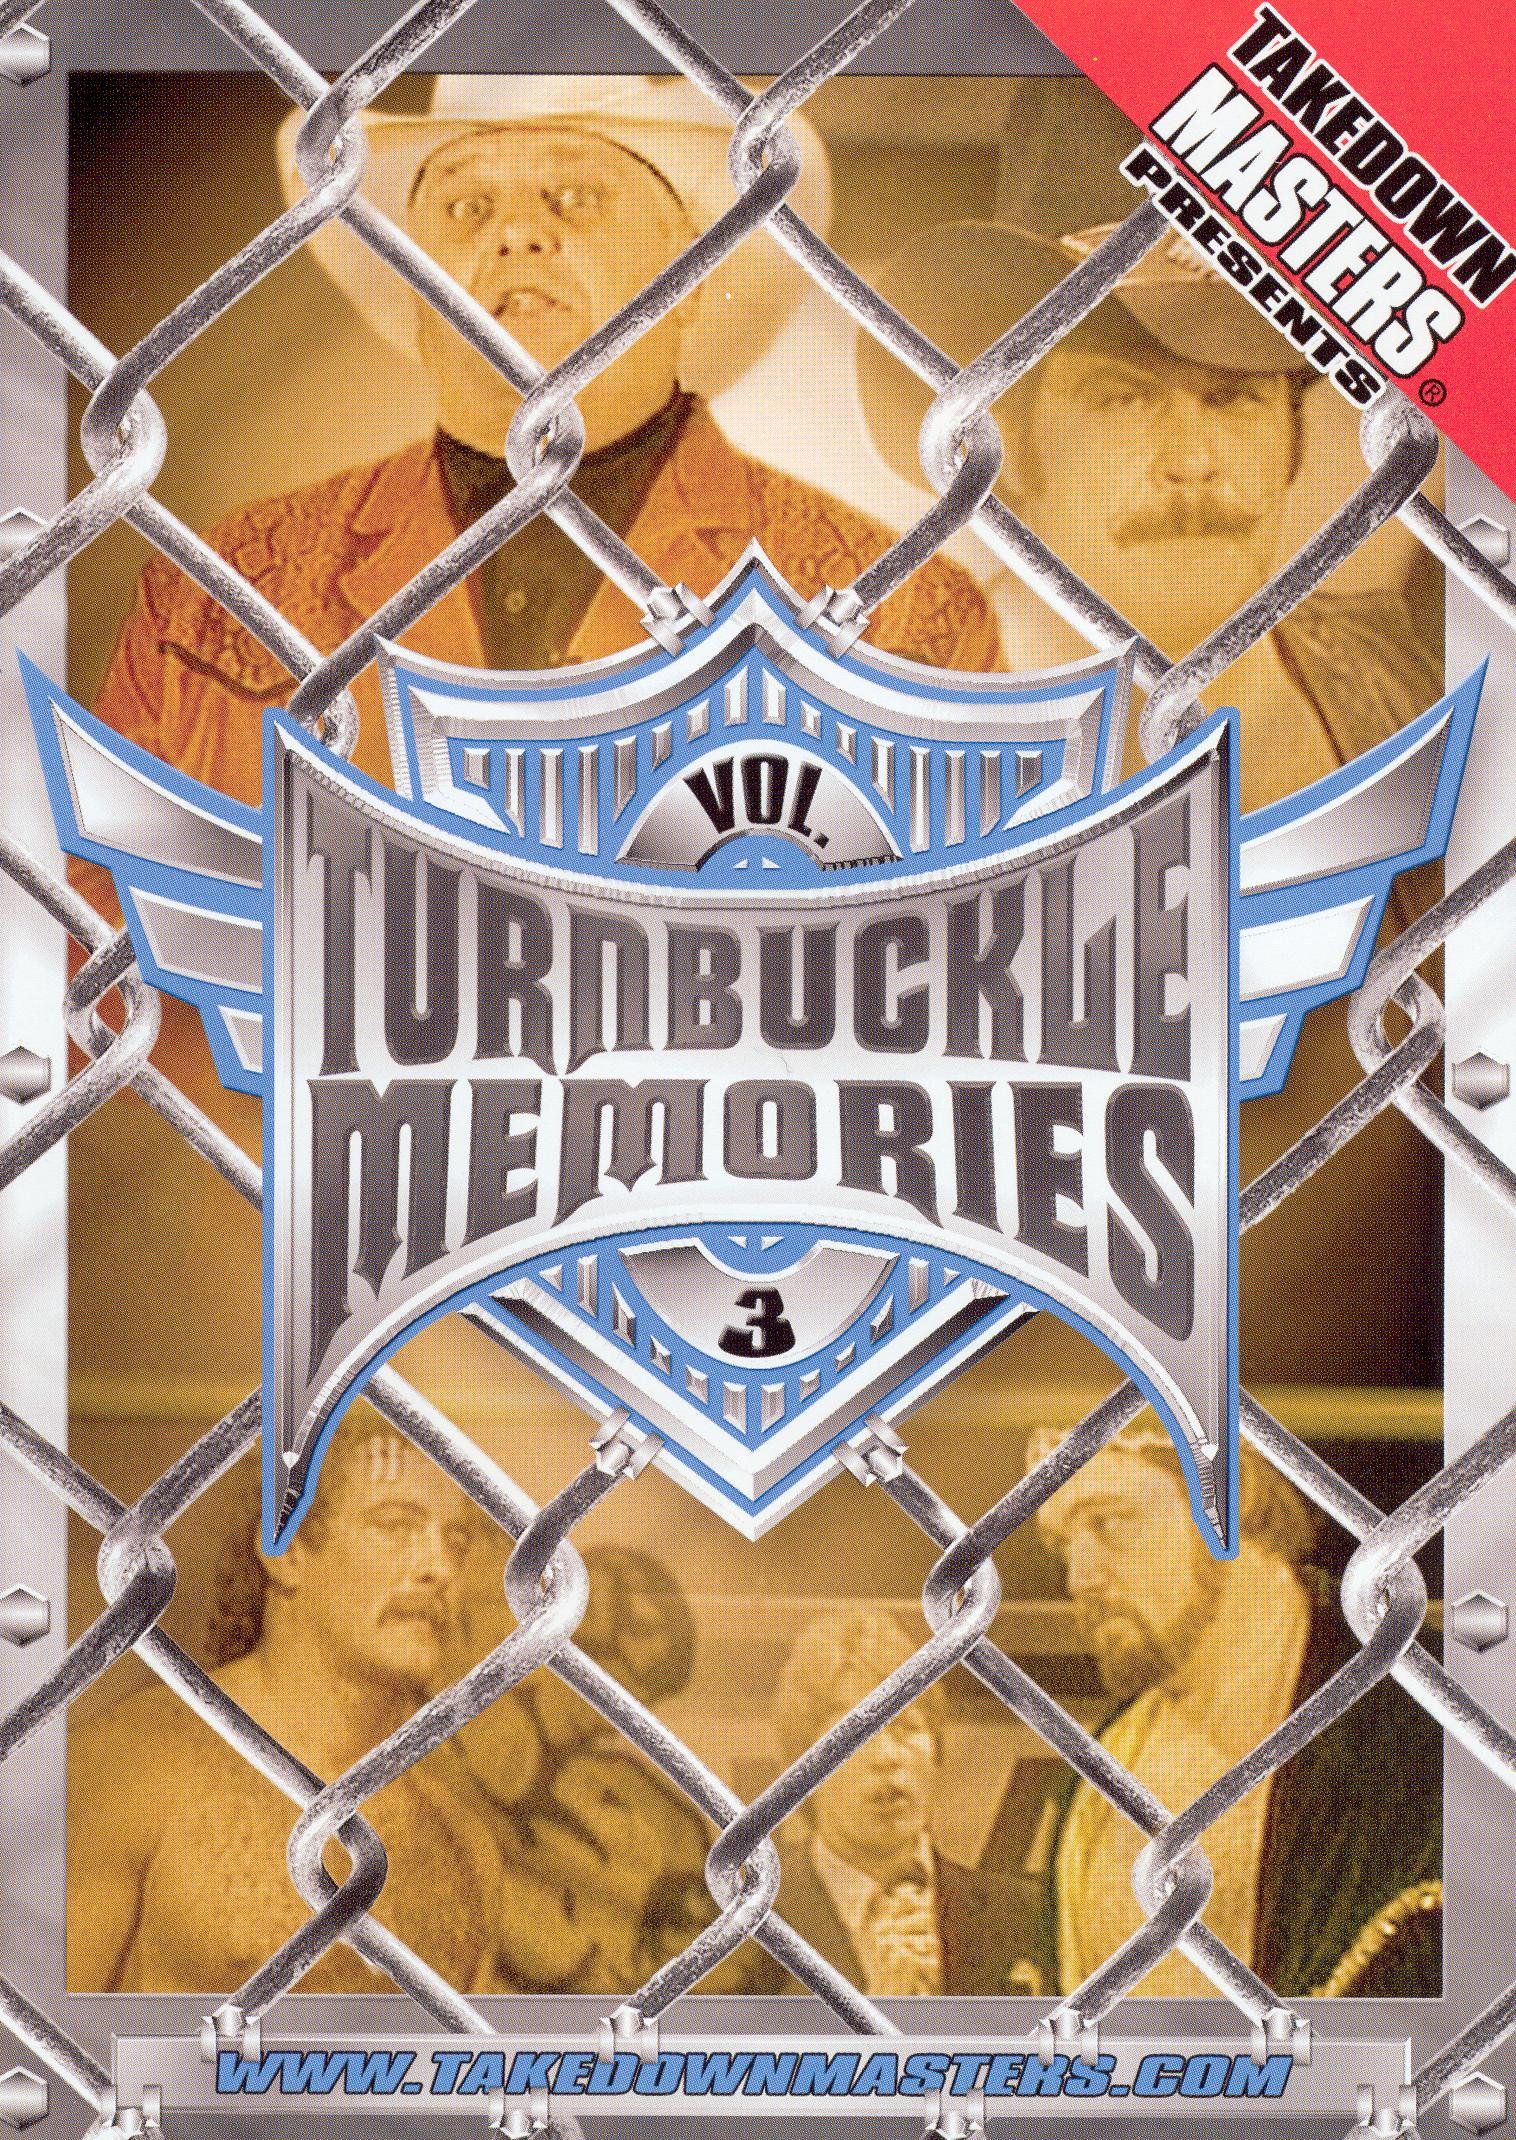 Takedown Masters: Turnbuckle Memories, Vol. 3